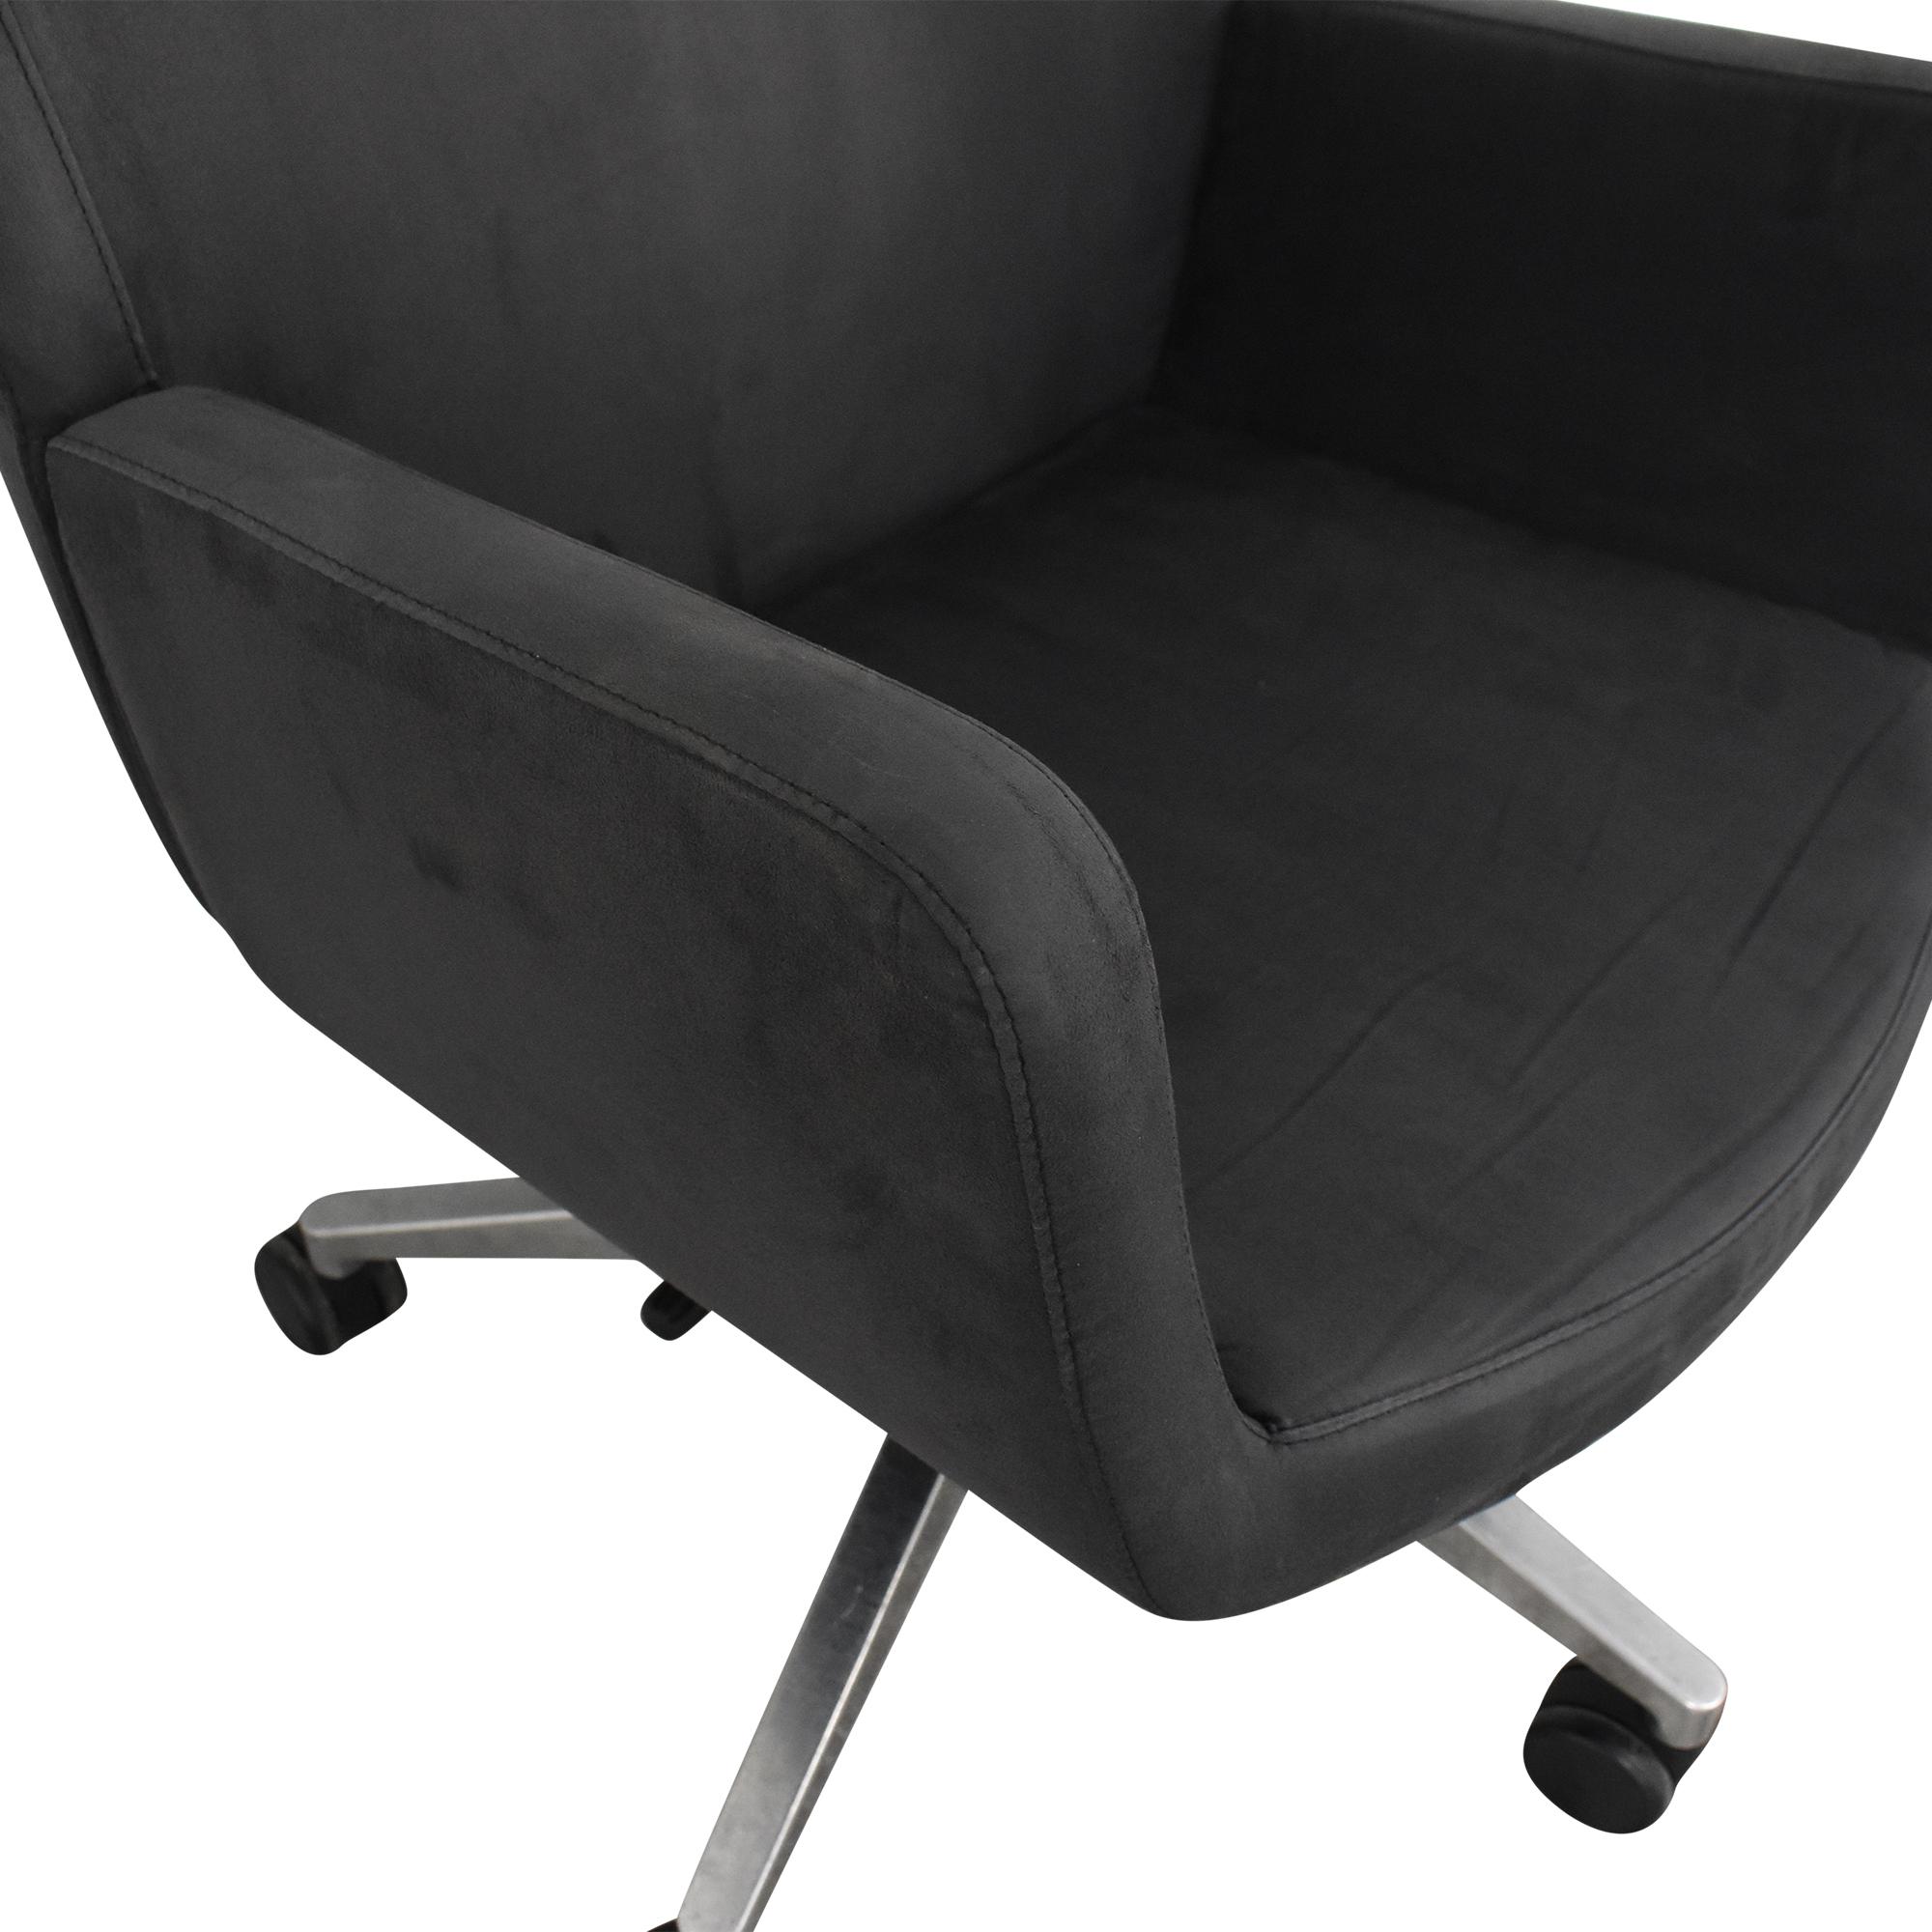 Steelcase Steelcase Coalesse Bindu Guest Chair discount